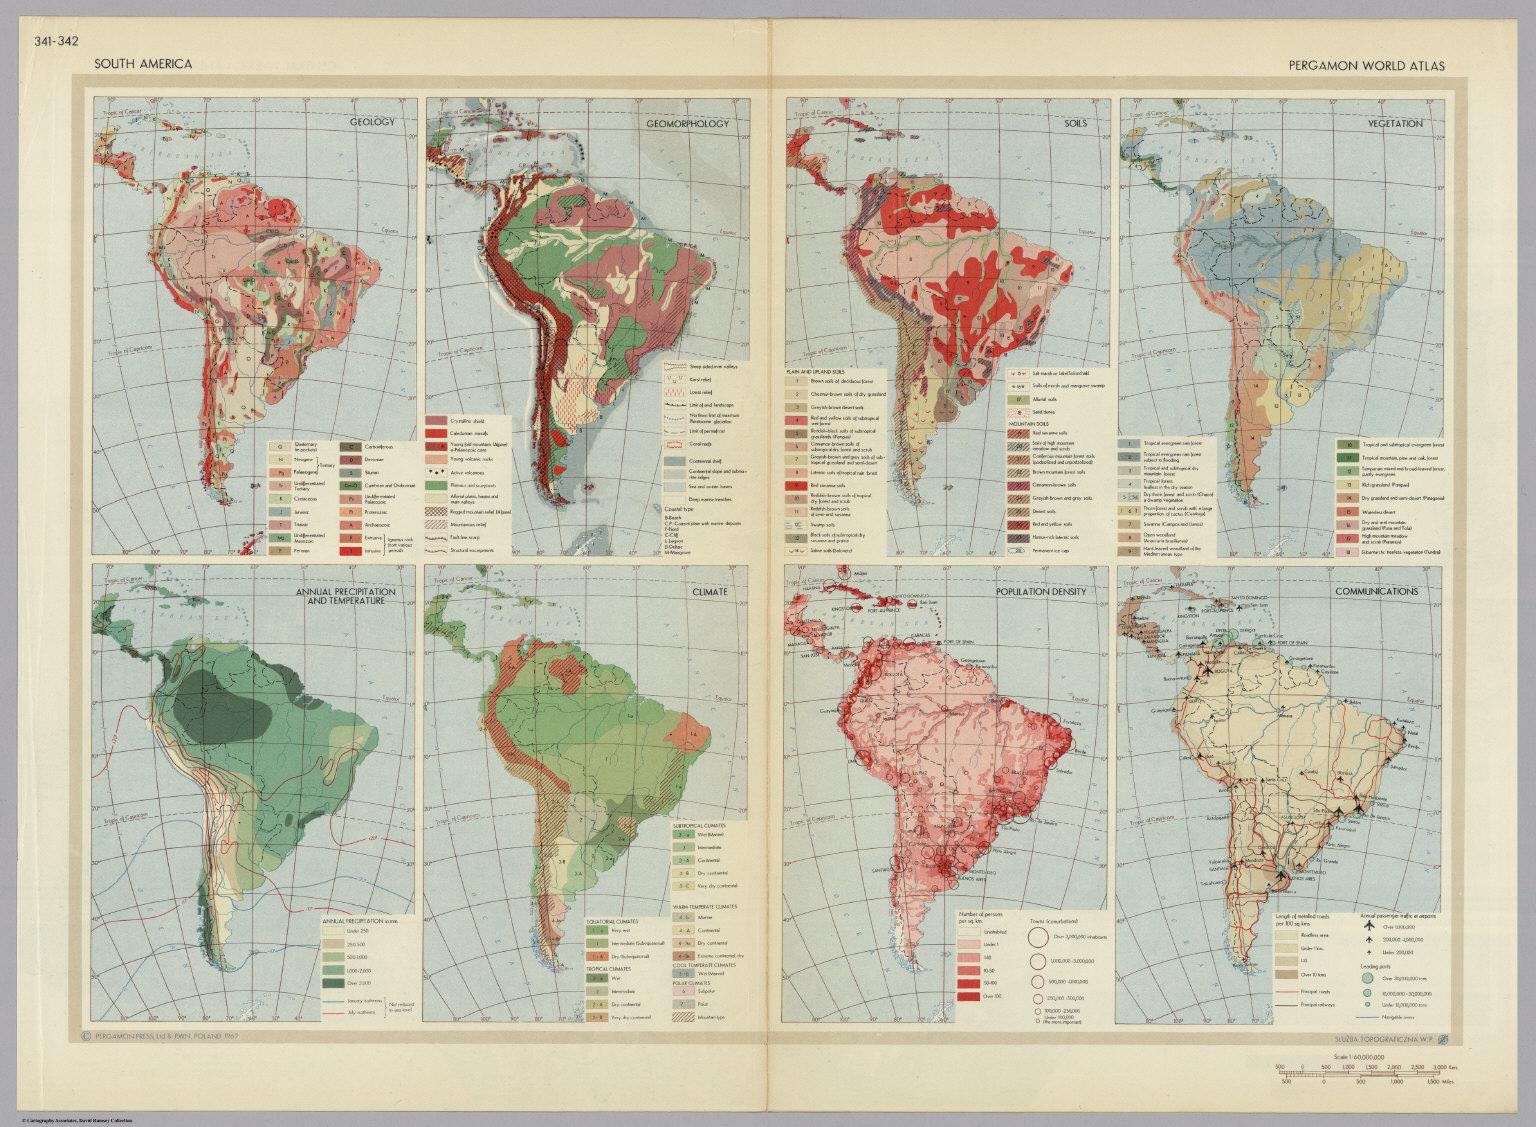 South america pergamon world atlas david rumsey historical map south america pergamon world atlas gumiabroncs Choice Image